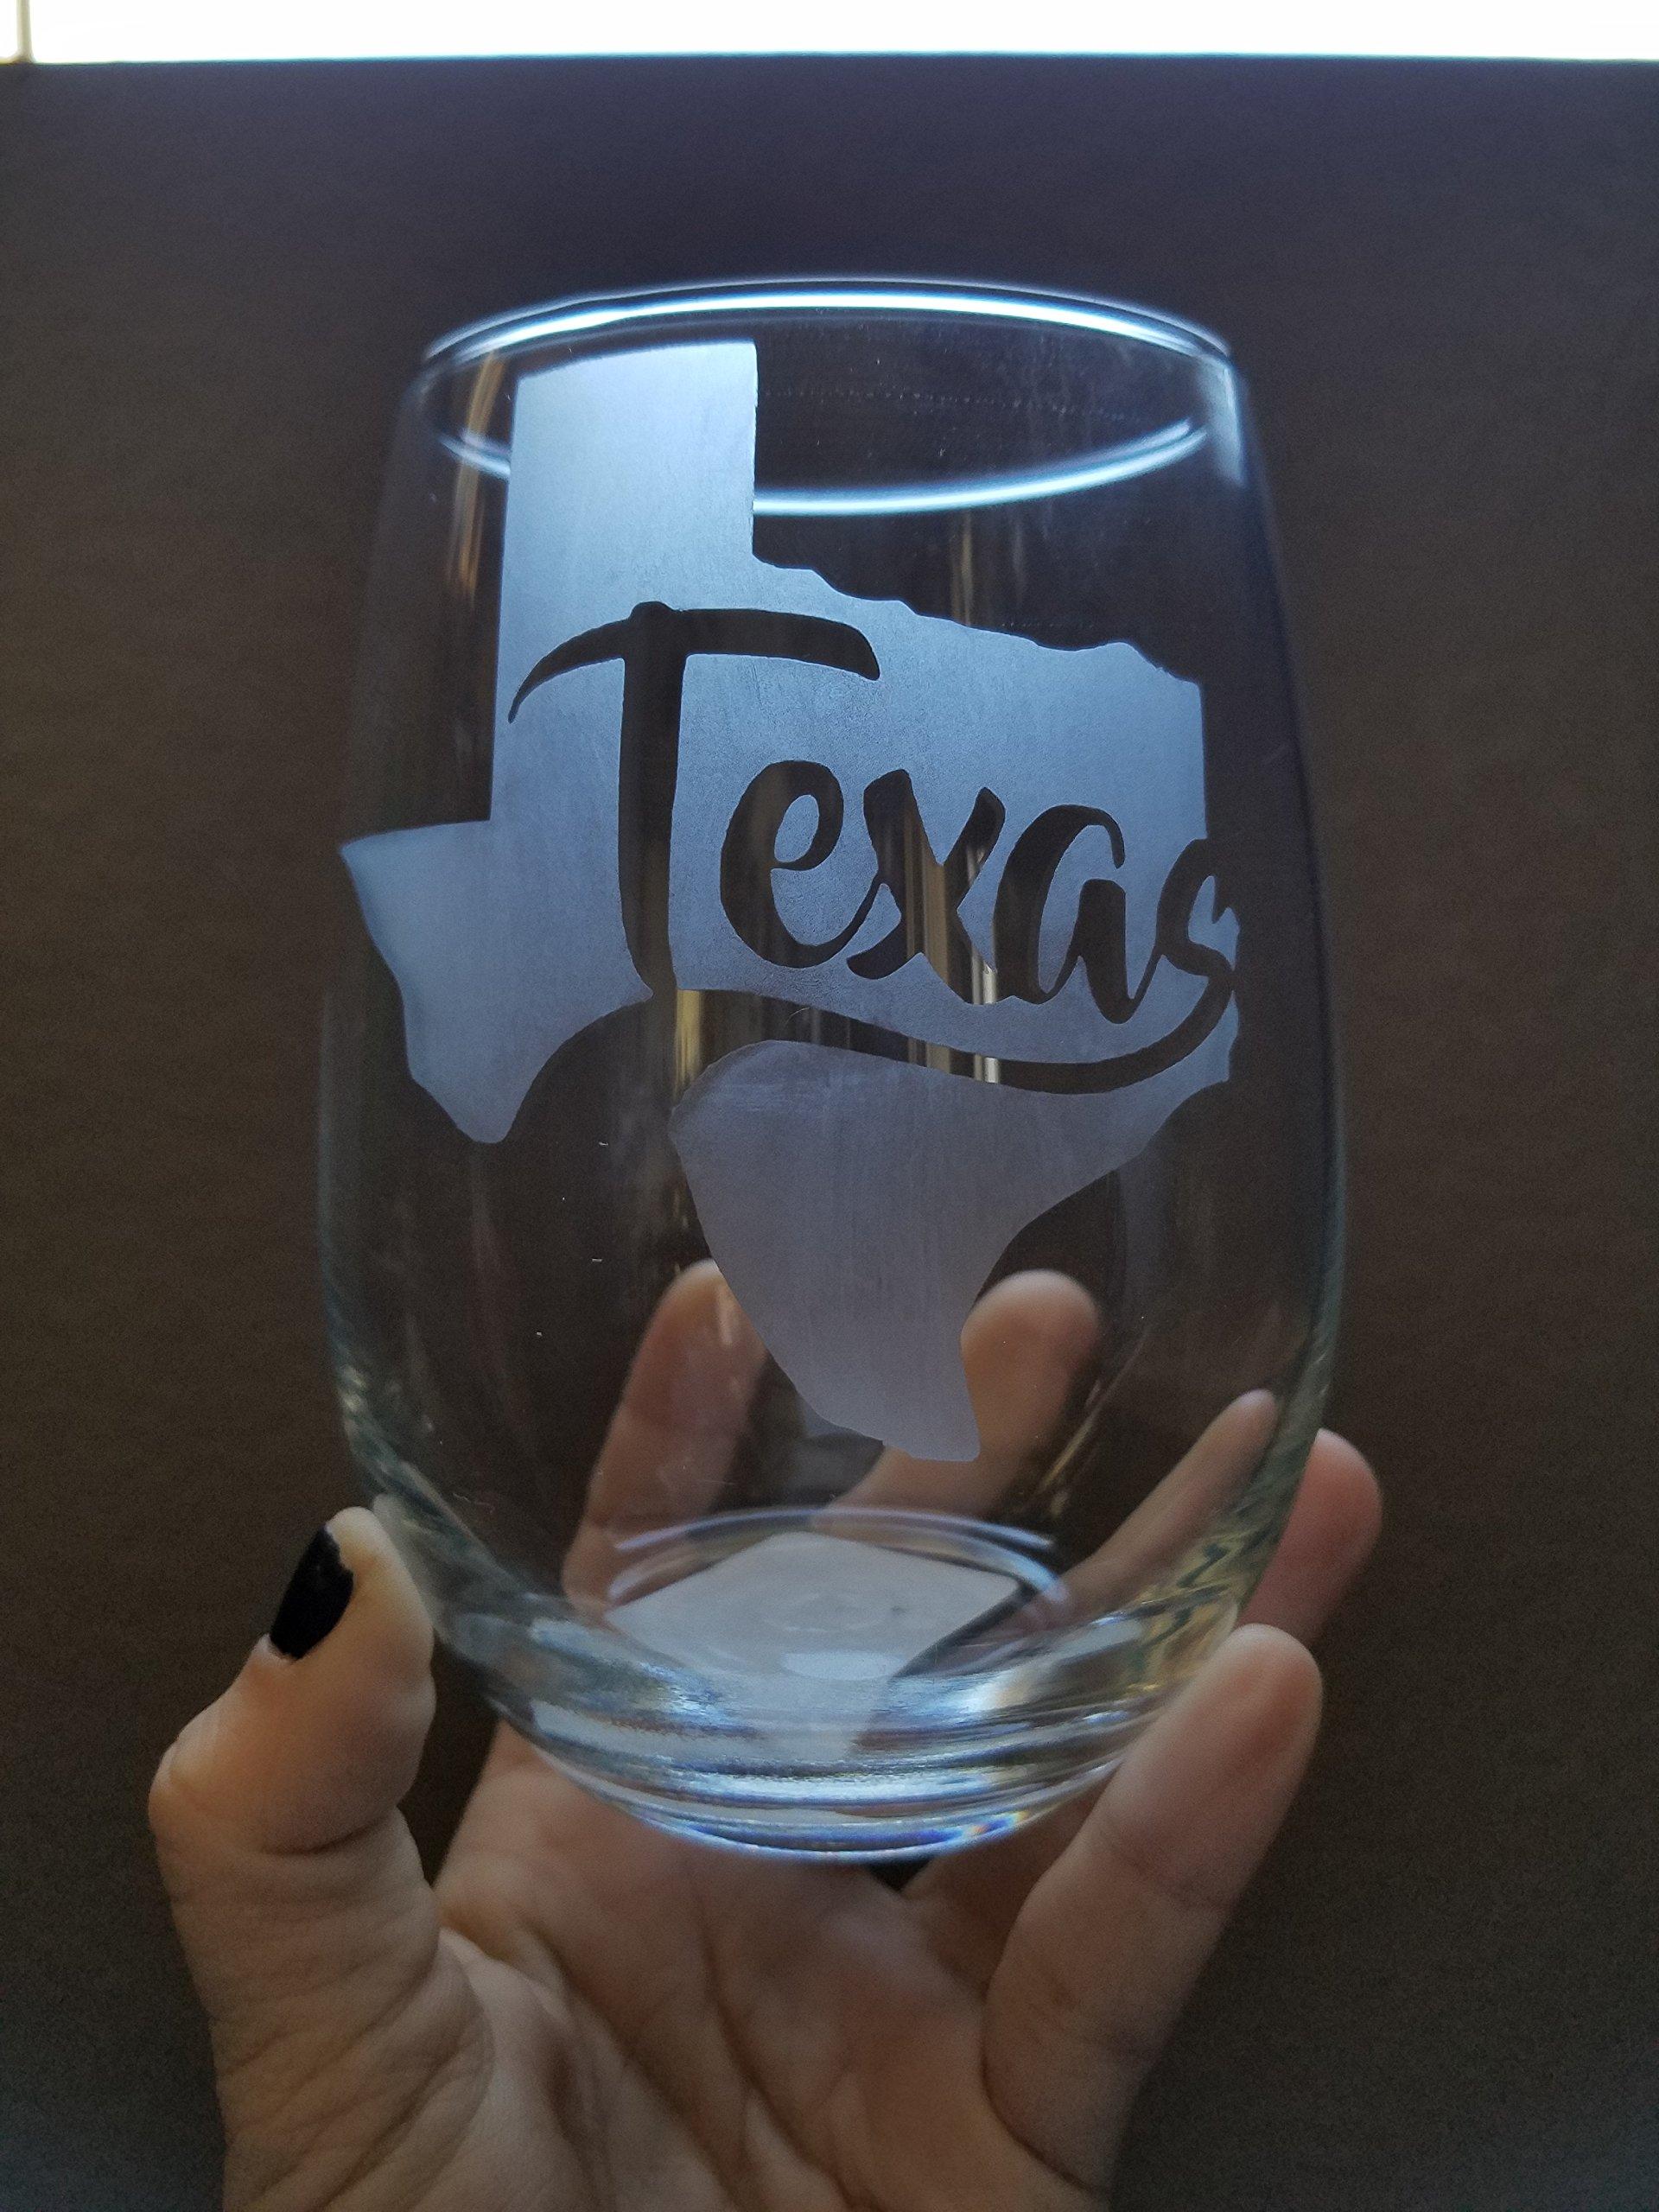 Texas Stemless Wine Glass White Wine Red Wine Glass